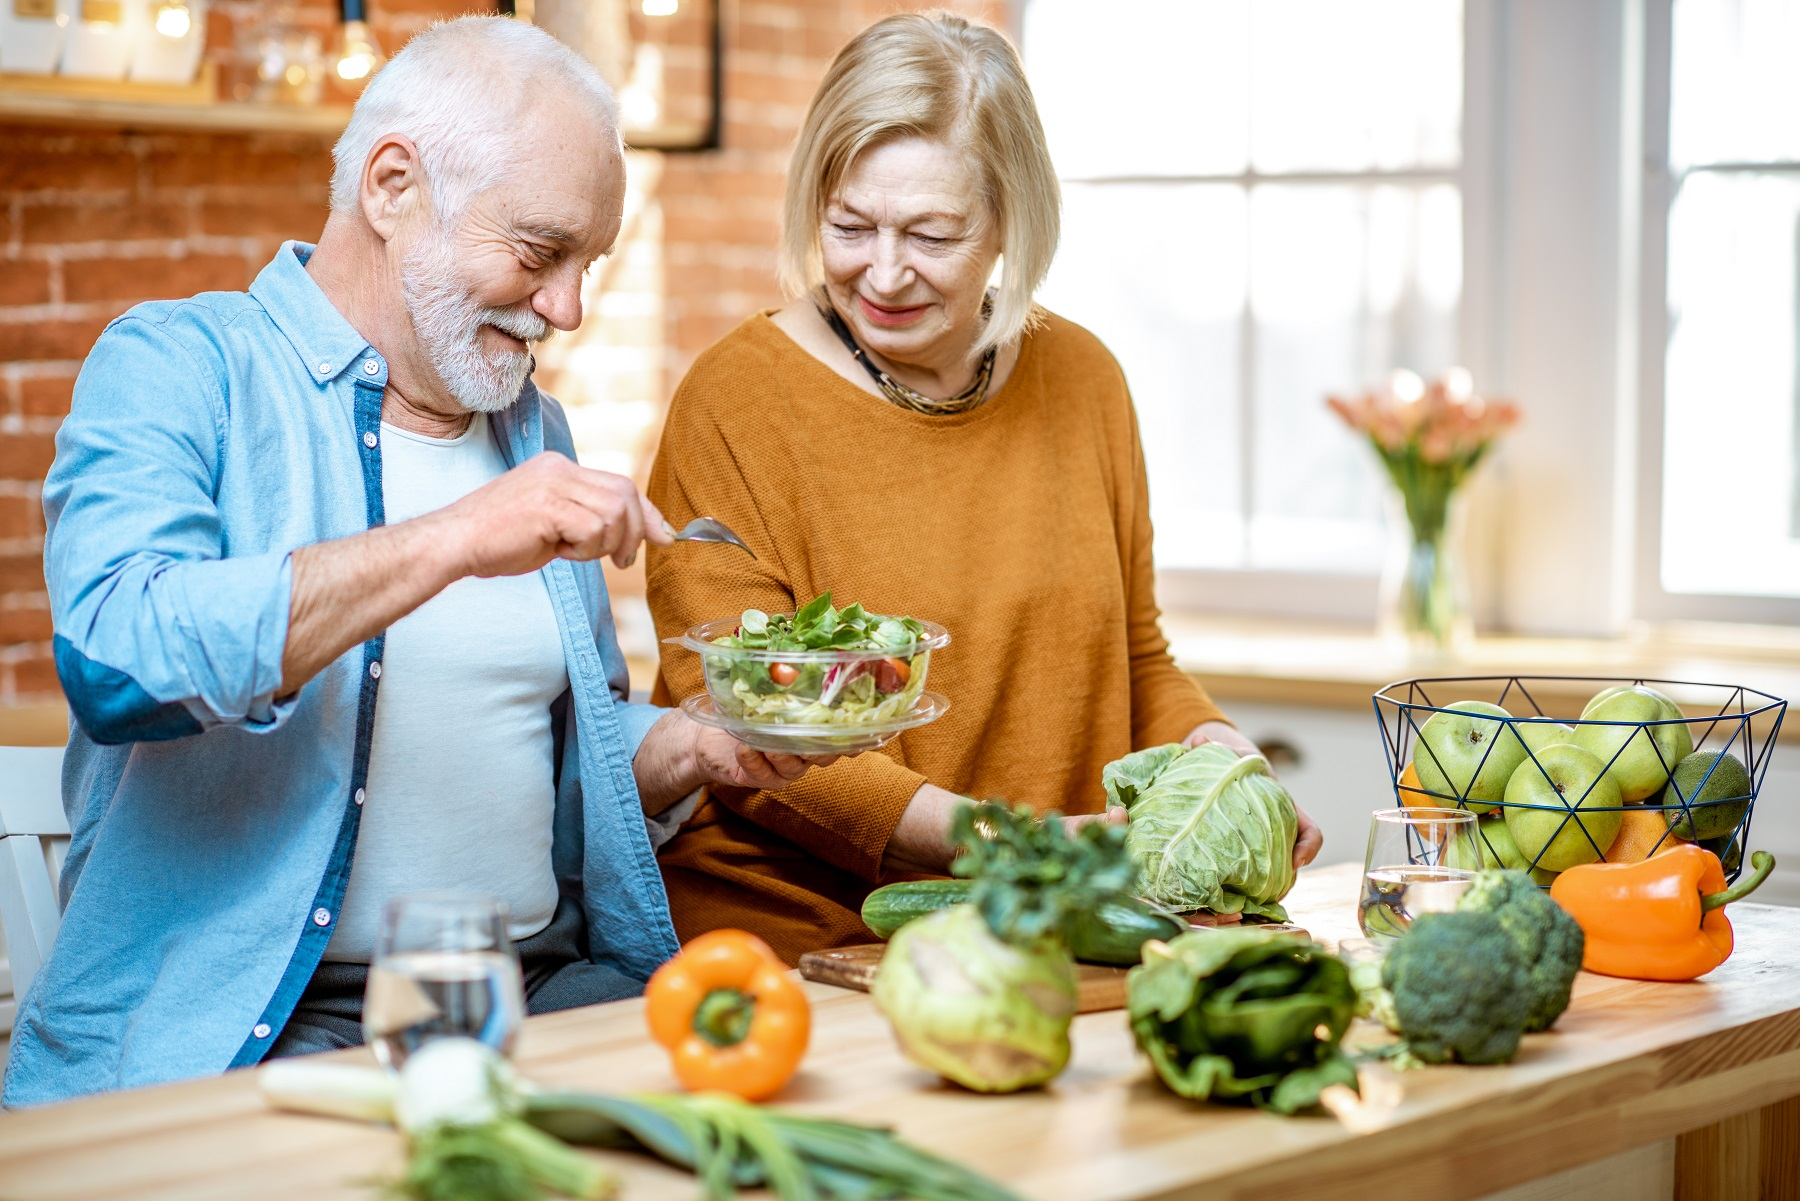 Seniors couple making nutritional meal, good for brain health